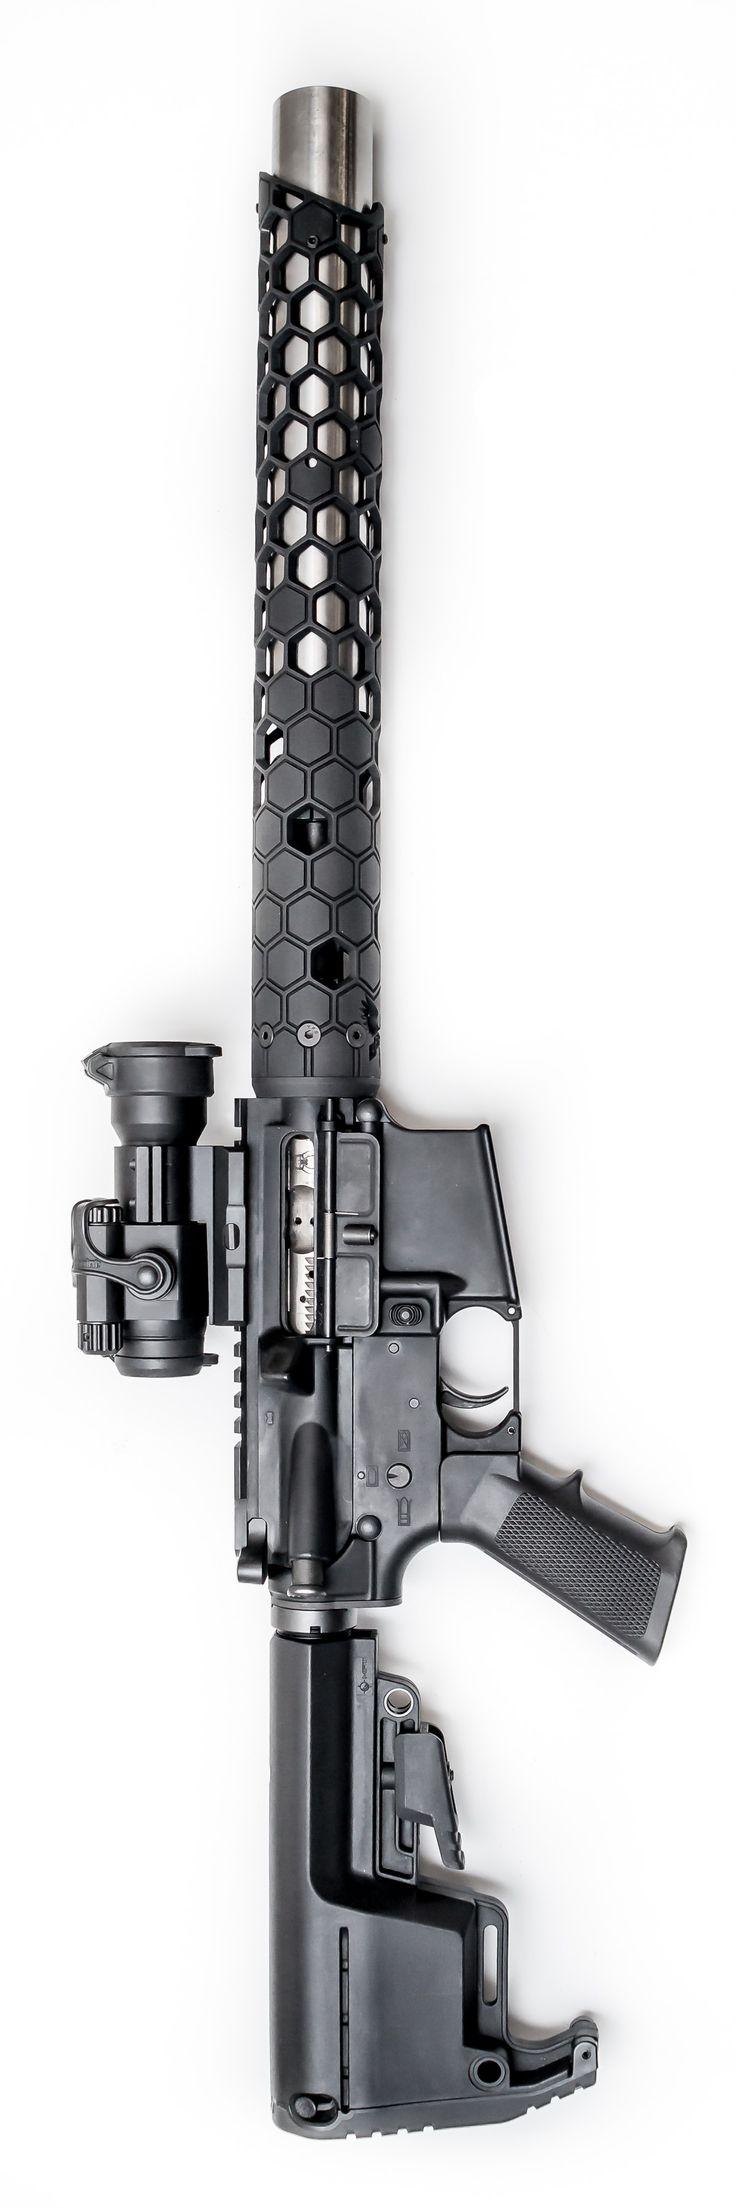 Integrally Suppressed AR-15 Upper in .223 5.56 Caliber - NEW Integrally Suppressed 5.56 NATO AR Rifle Firearm Upper design by Witt Machine & Tool. @aegisgears